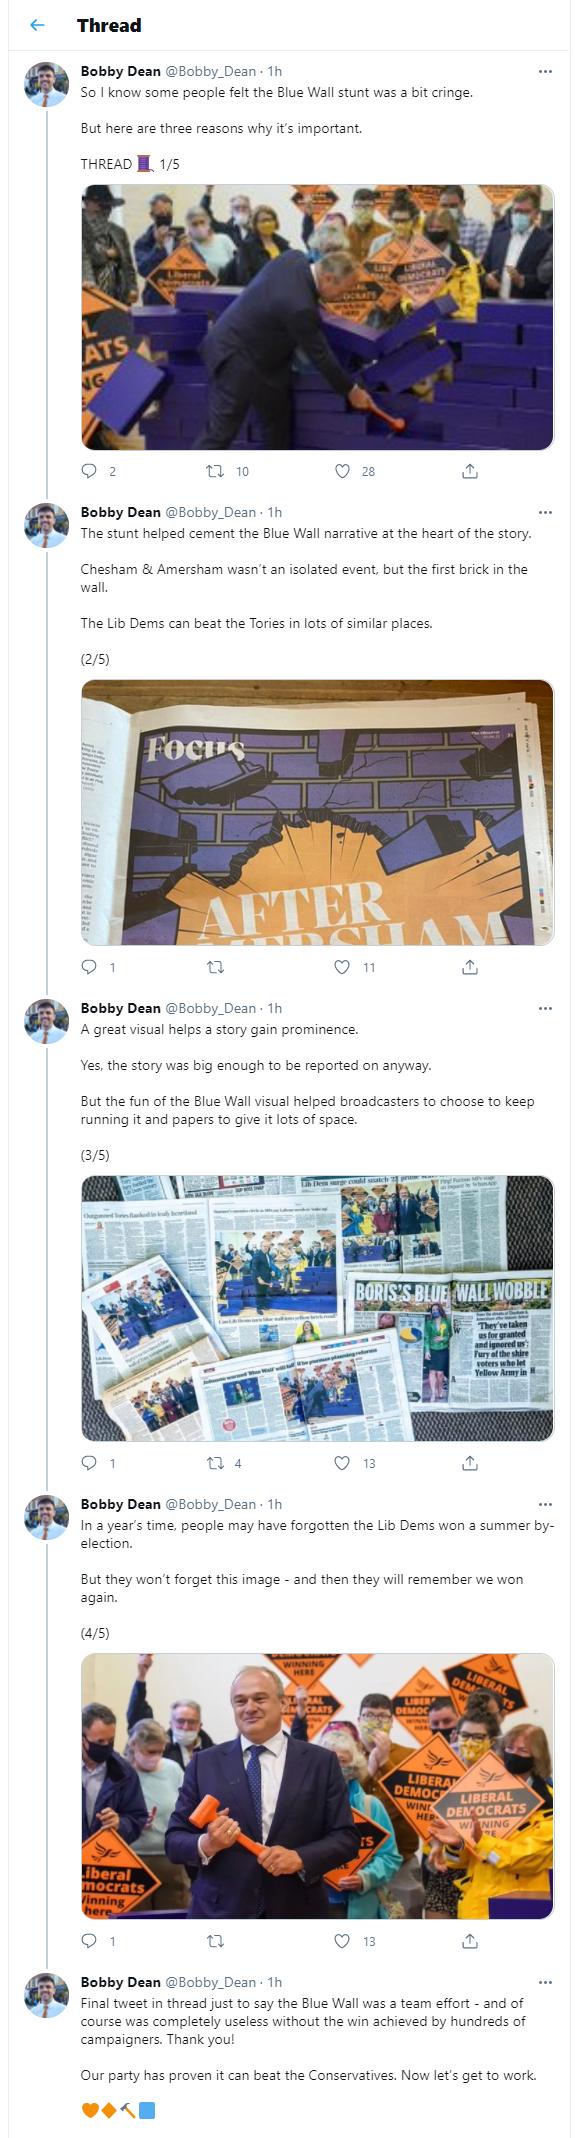 Bobby Dean explains the Blue Wall photo op